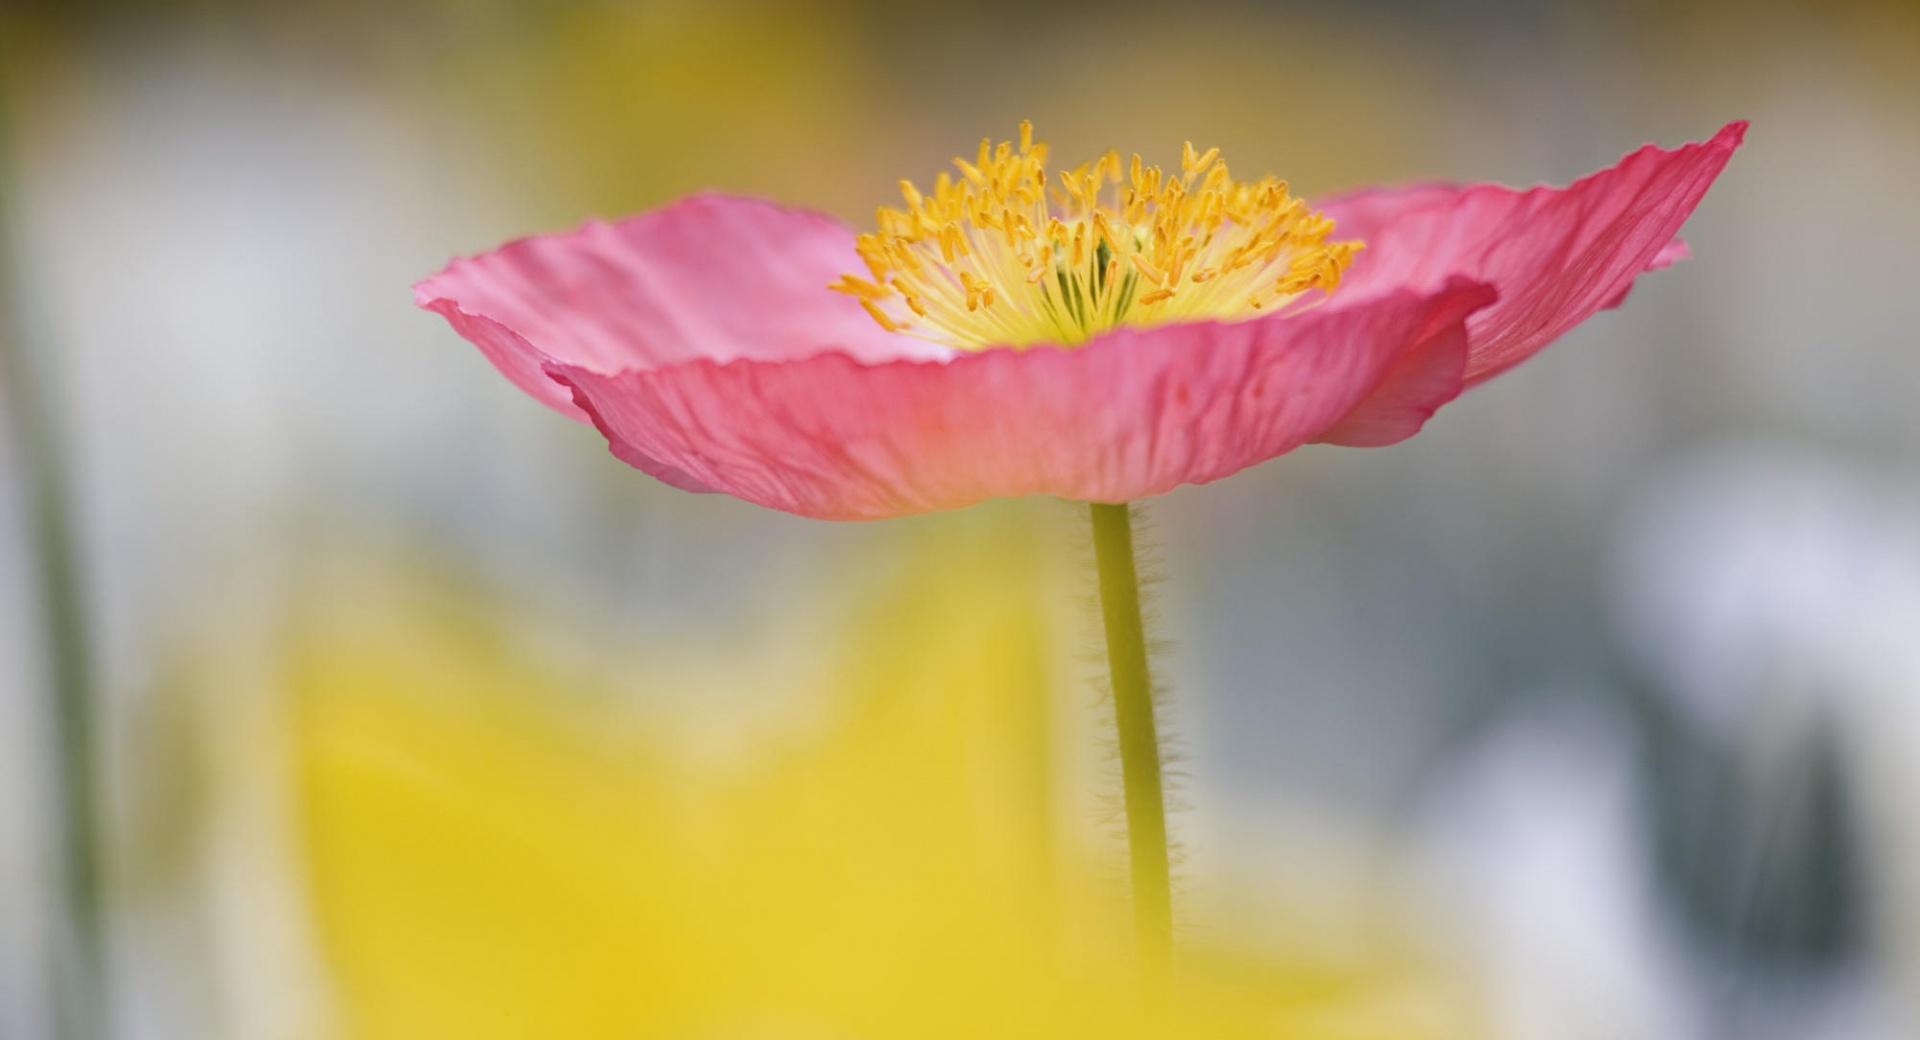 Single Poppy In Garden Charleston South Carolina wallpapers HD quality